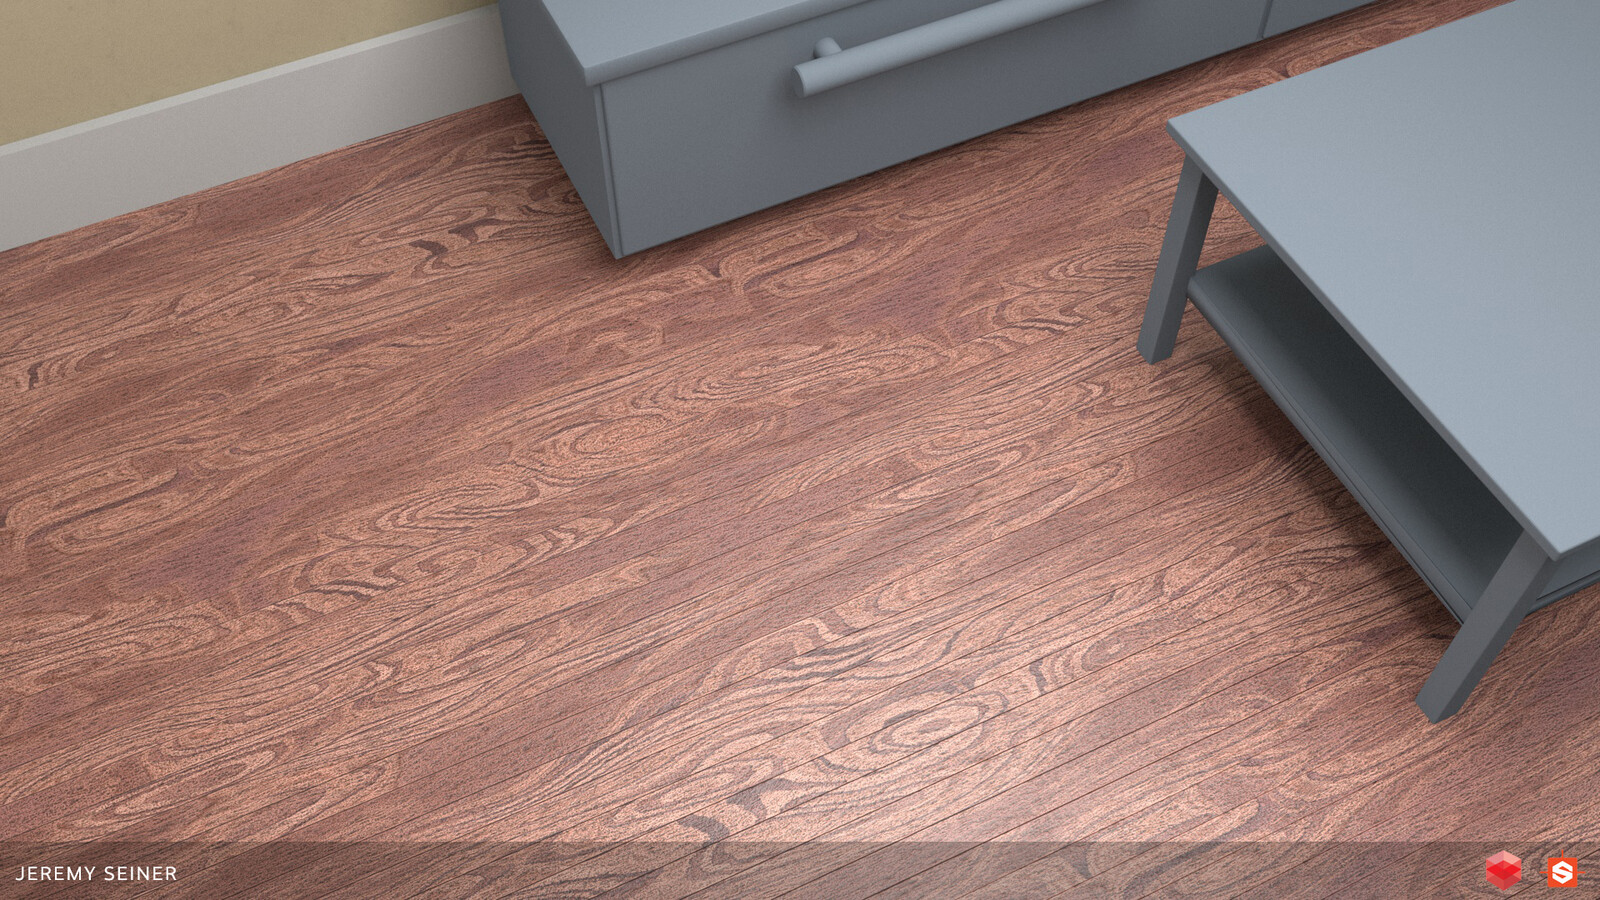 Example of basic wood floor.